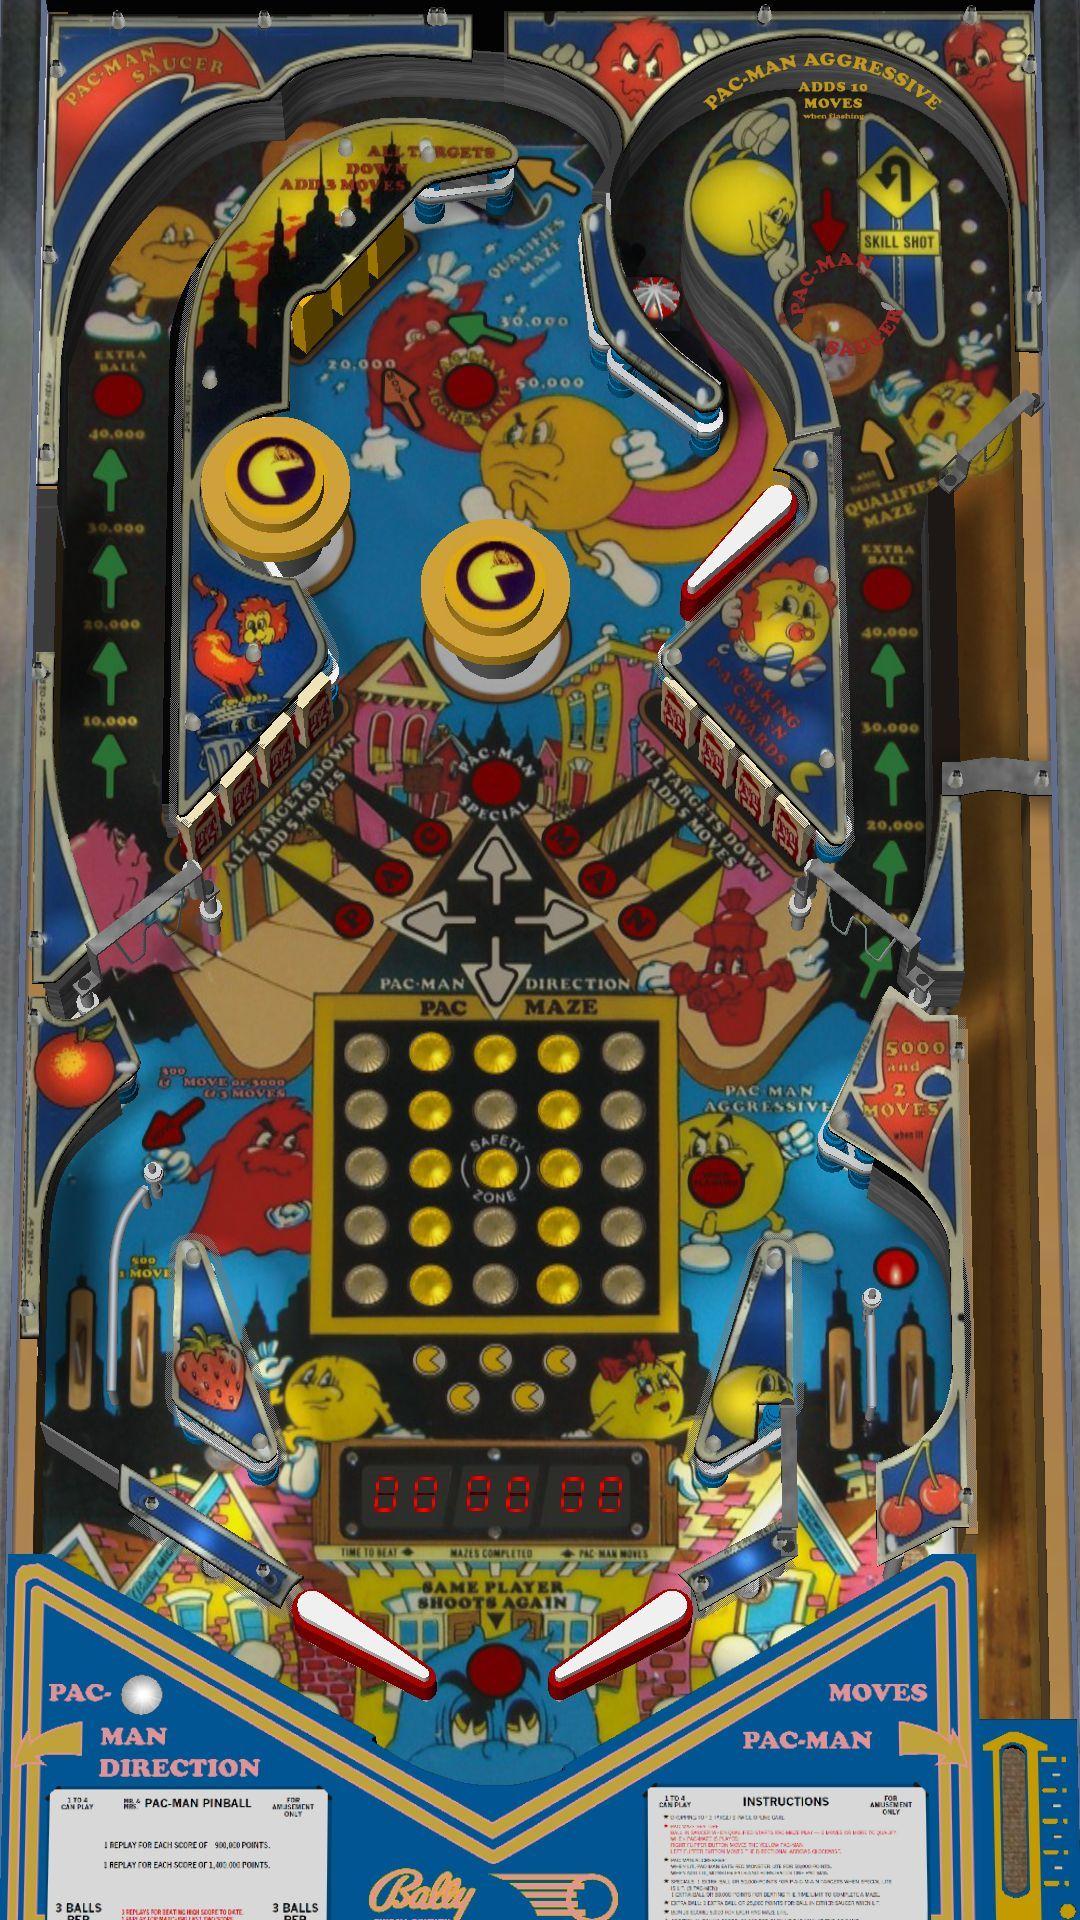 pacman pinball game Google Search Pinball, Pacman